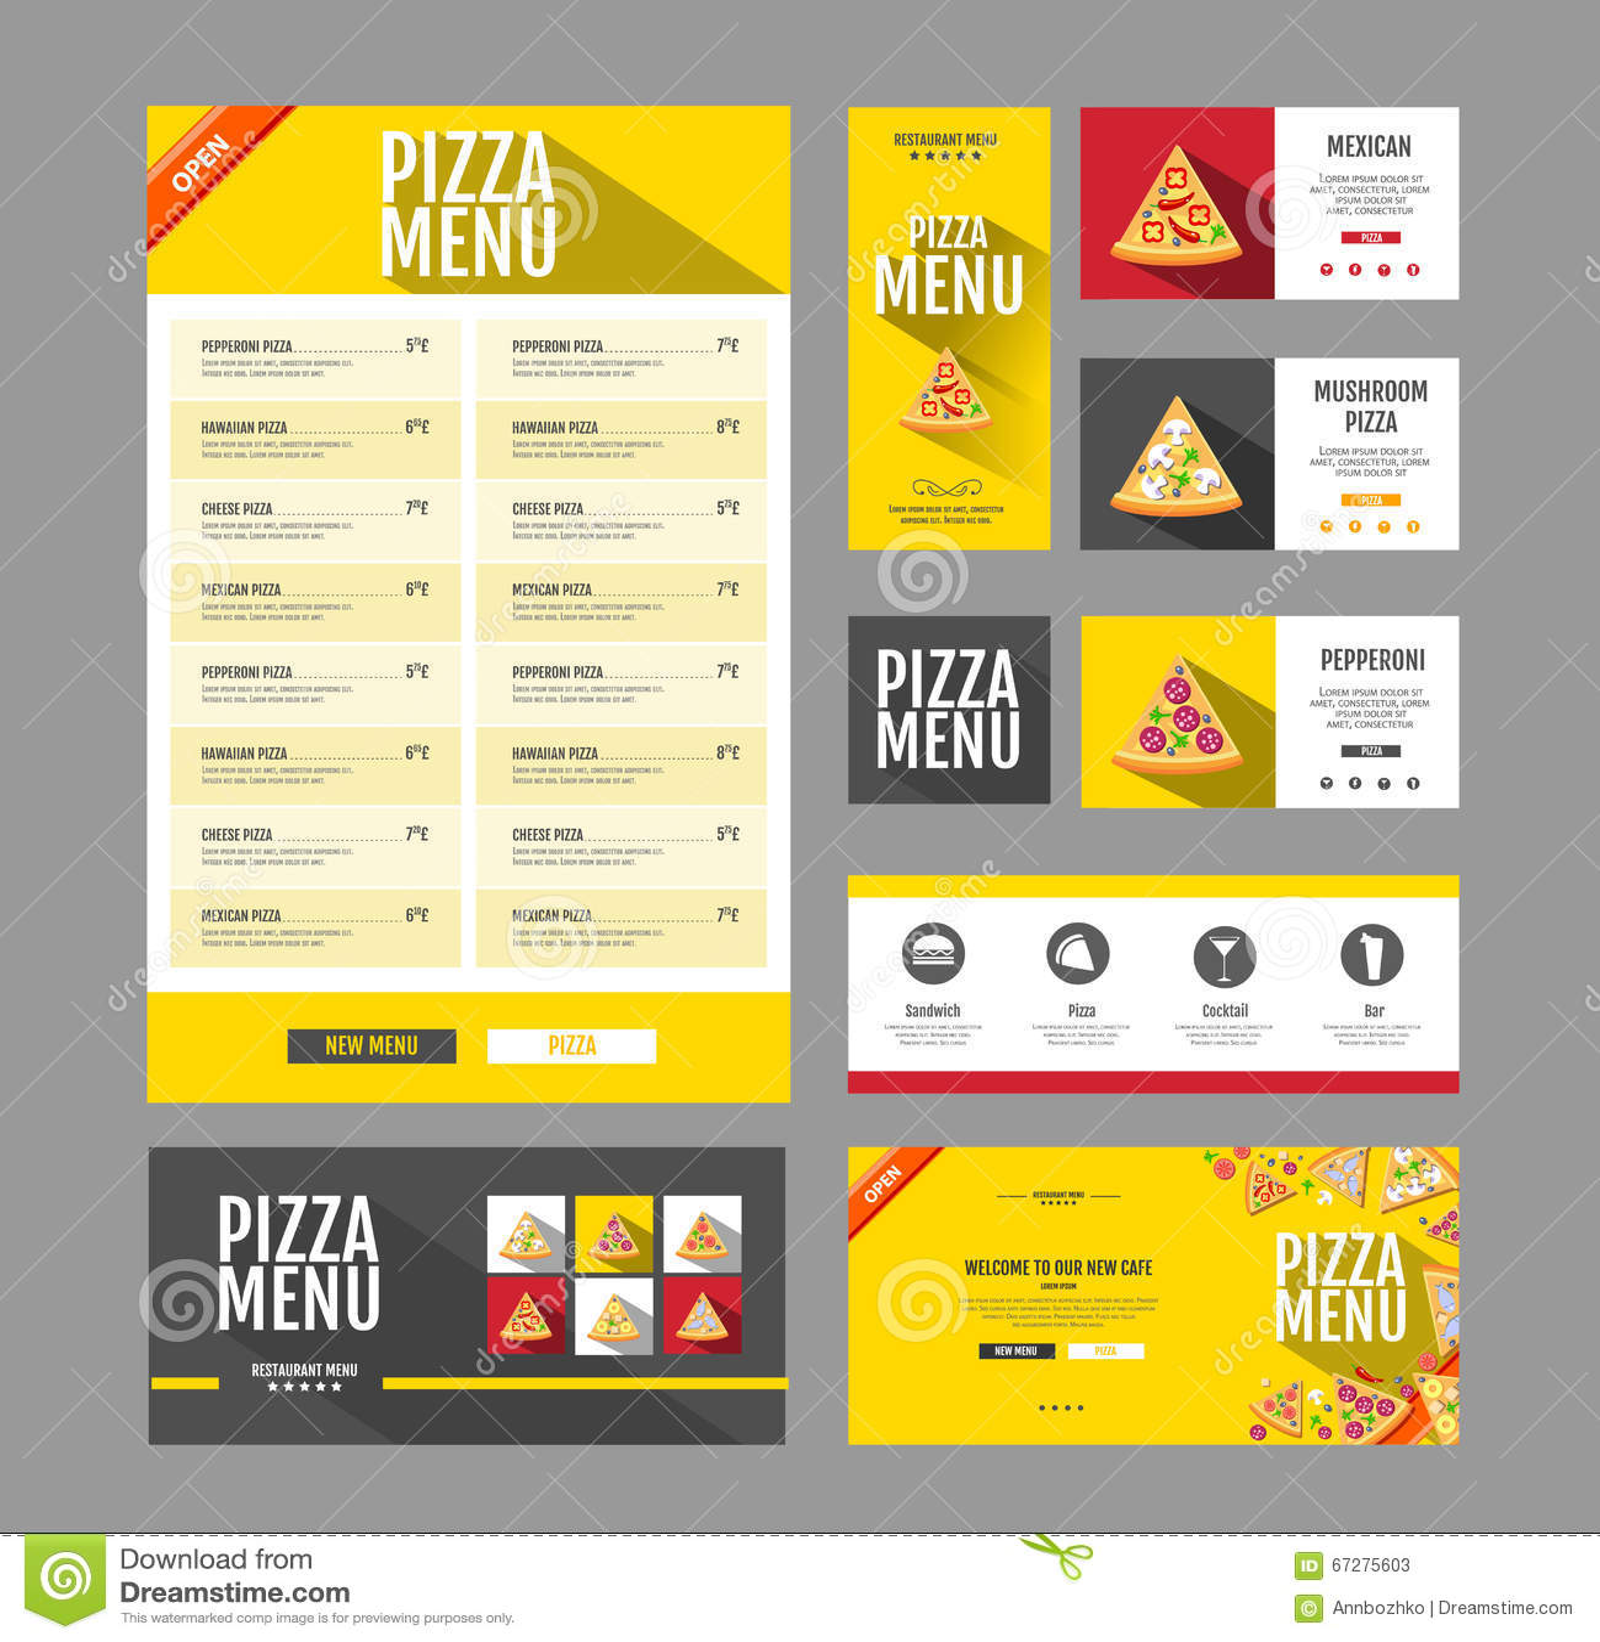 flat style pizza menu design  document template  stock